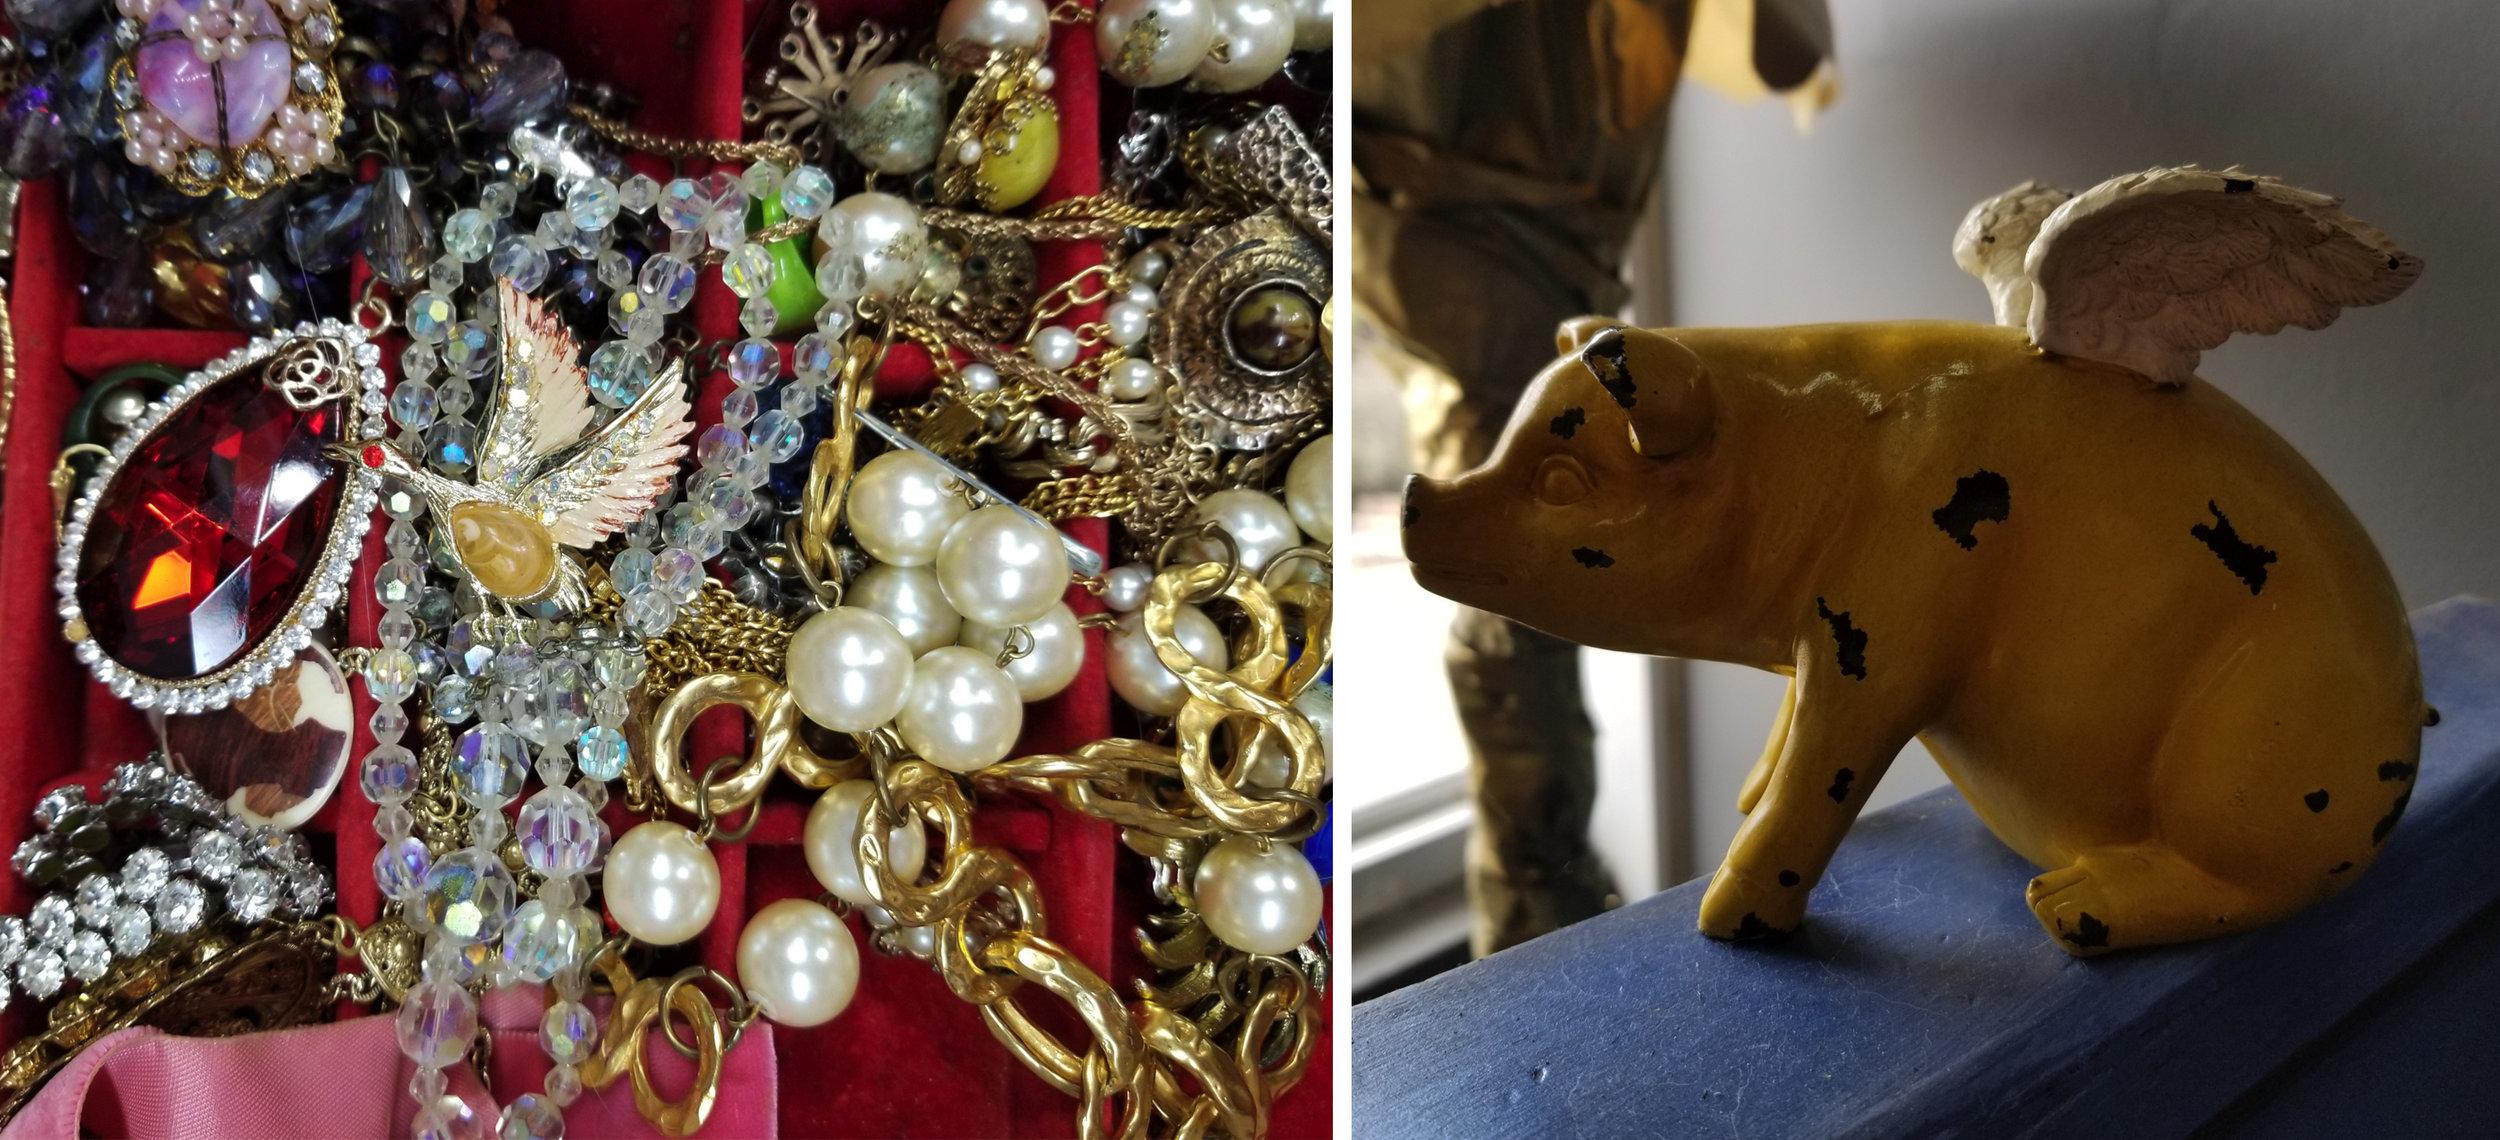 Grandma's Jewellery & The Flying Pig